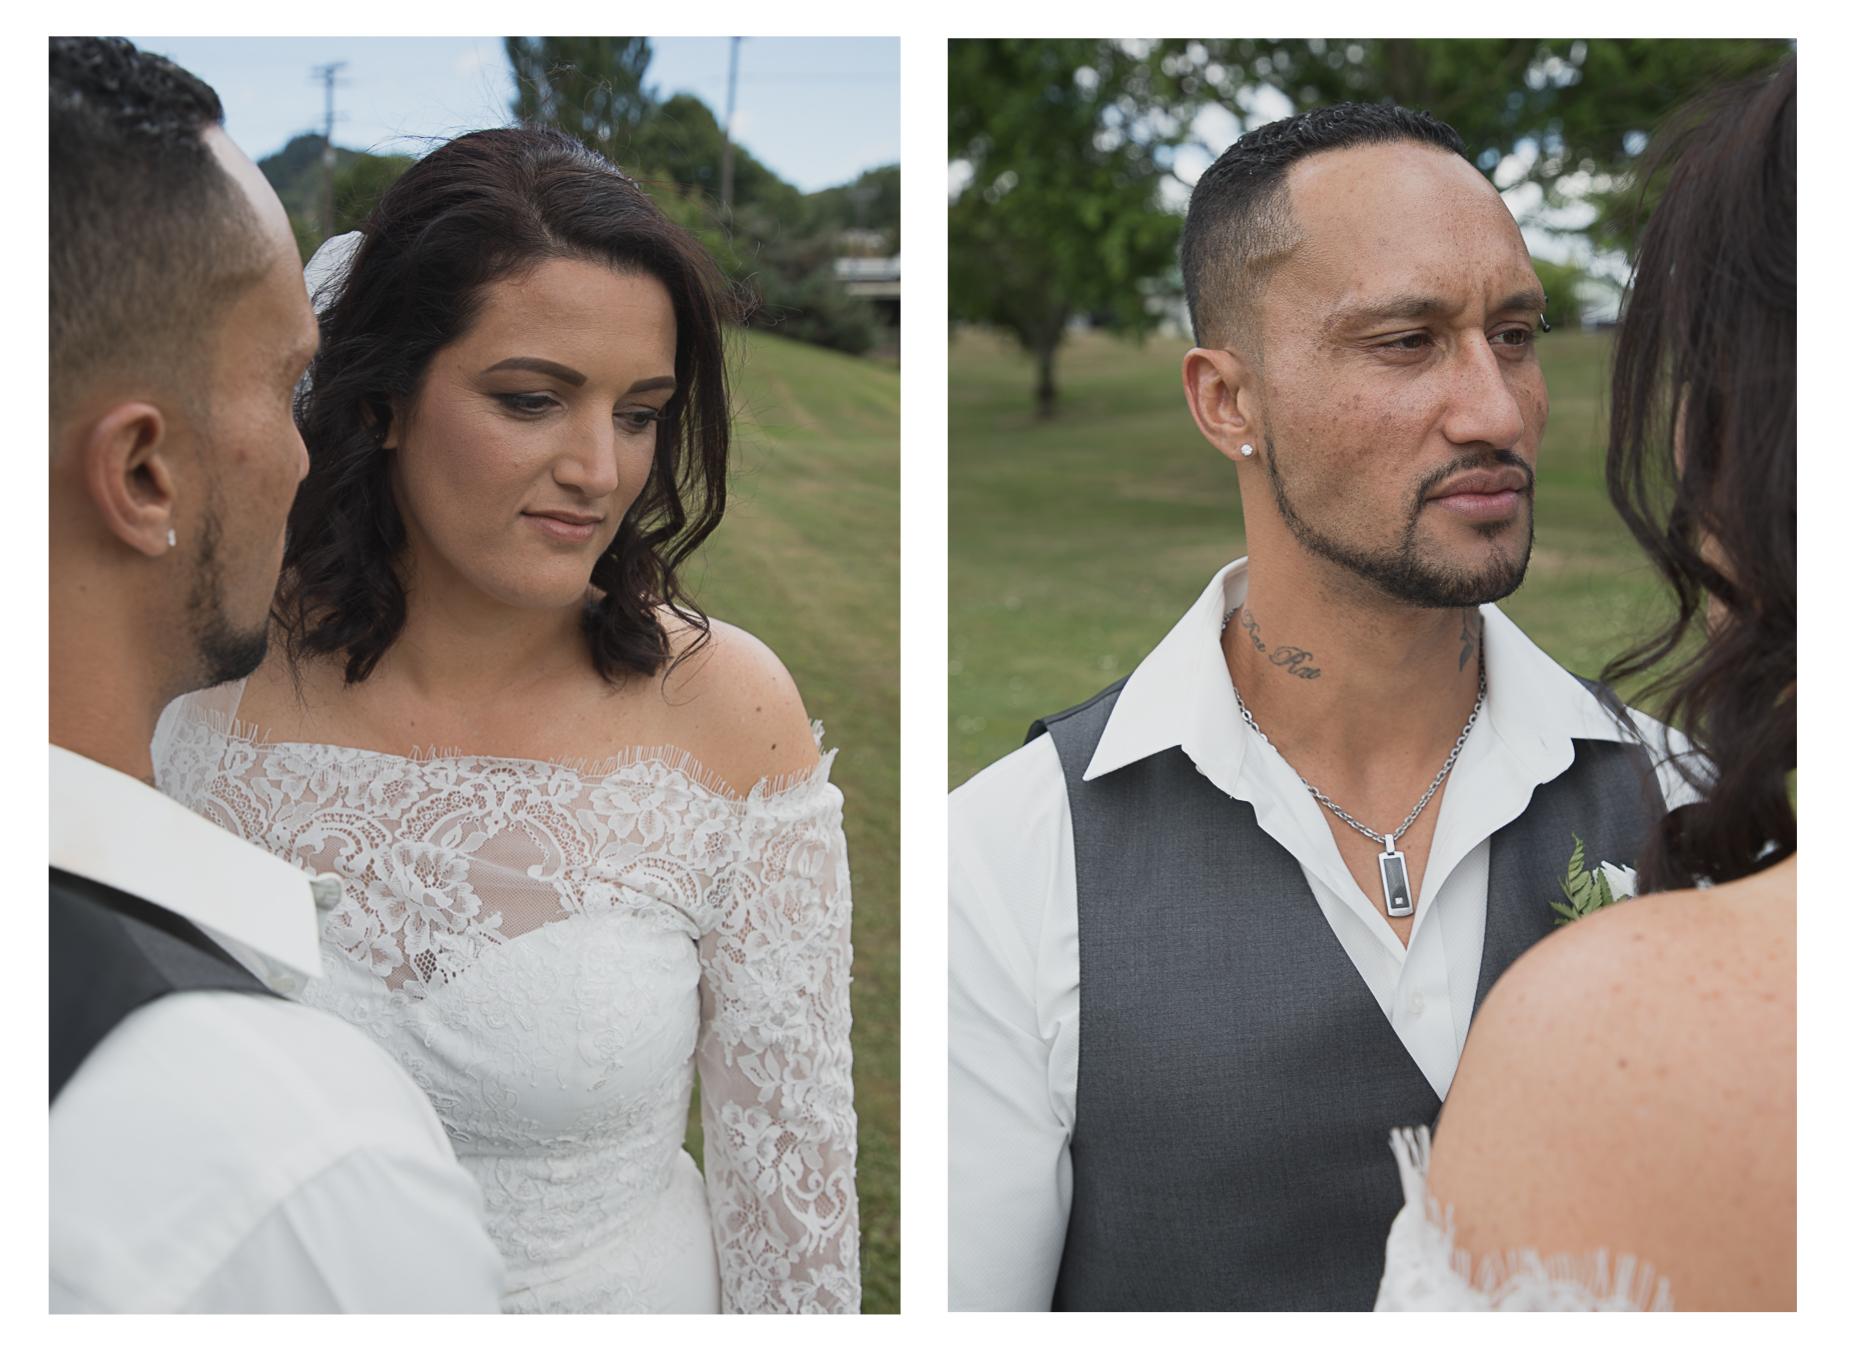 groom admiring his bride